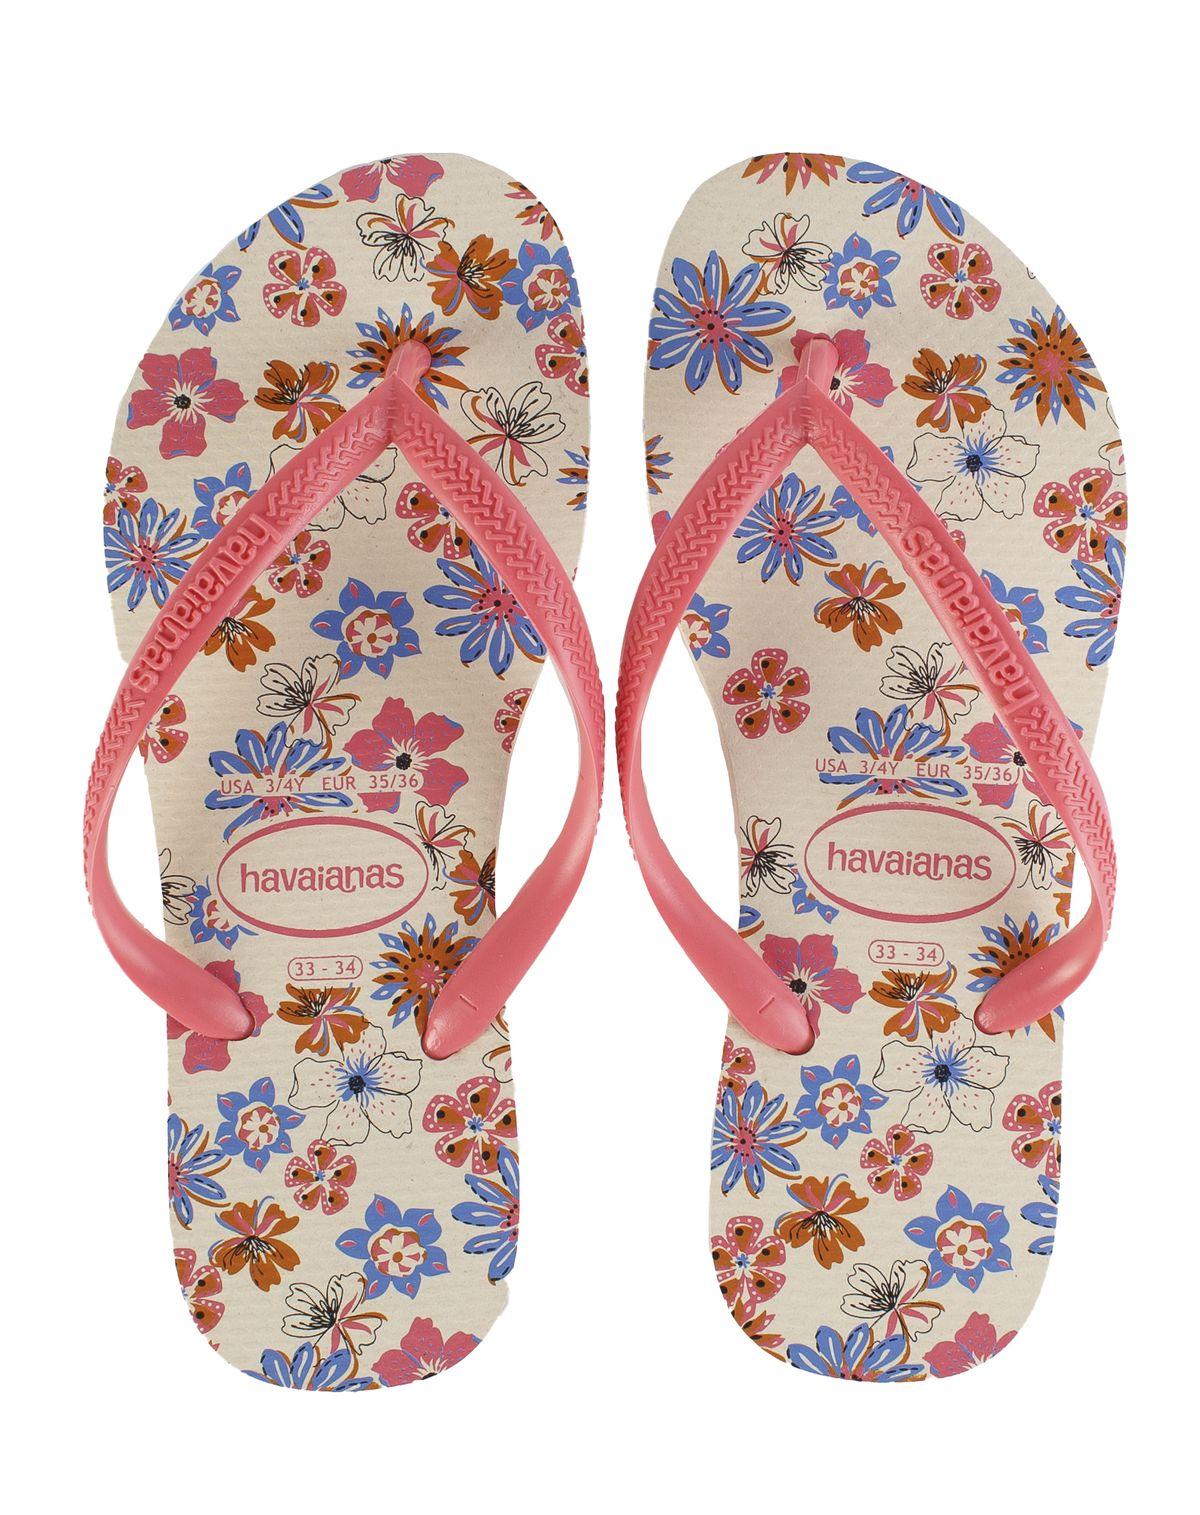 558928001-chinelo-feminino-havaianas-slim-romance-bege-rosa-33-4-1f2